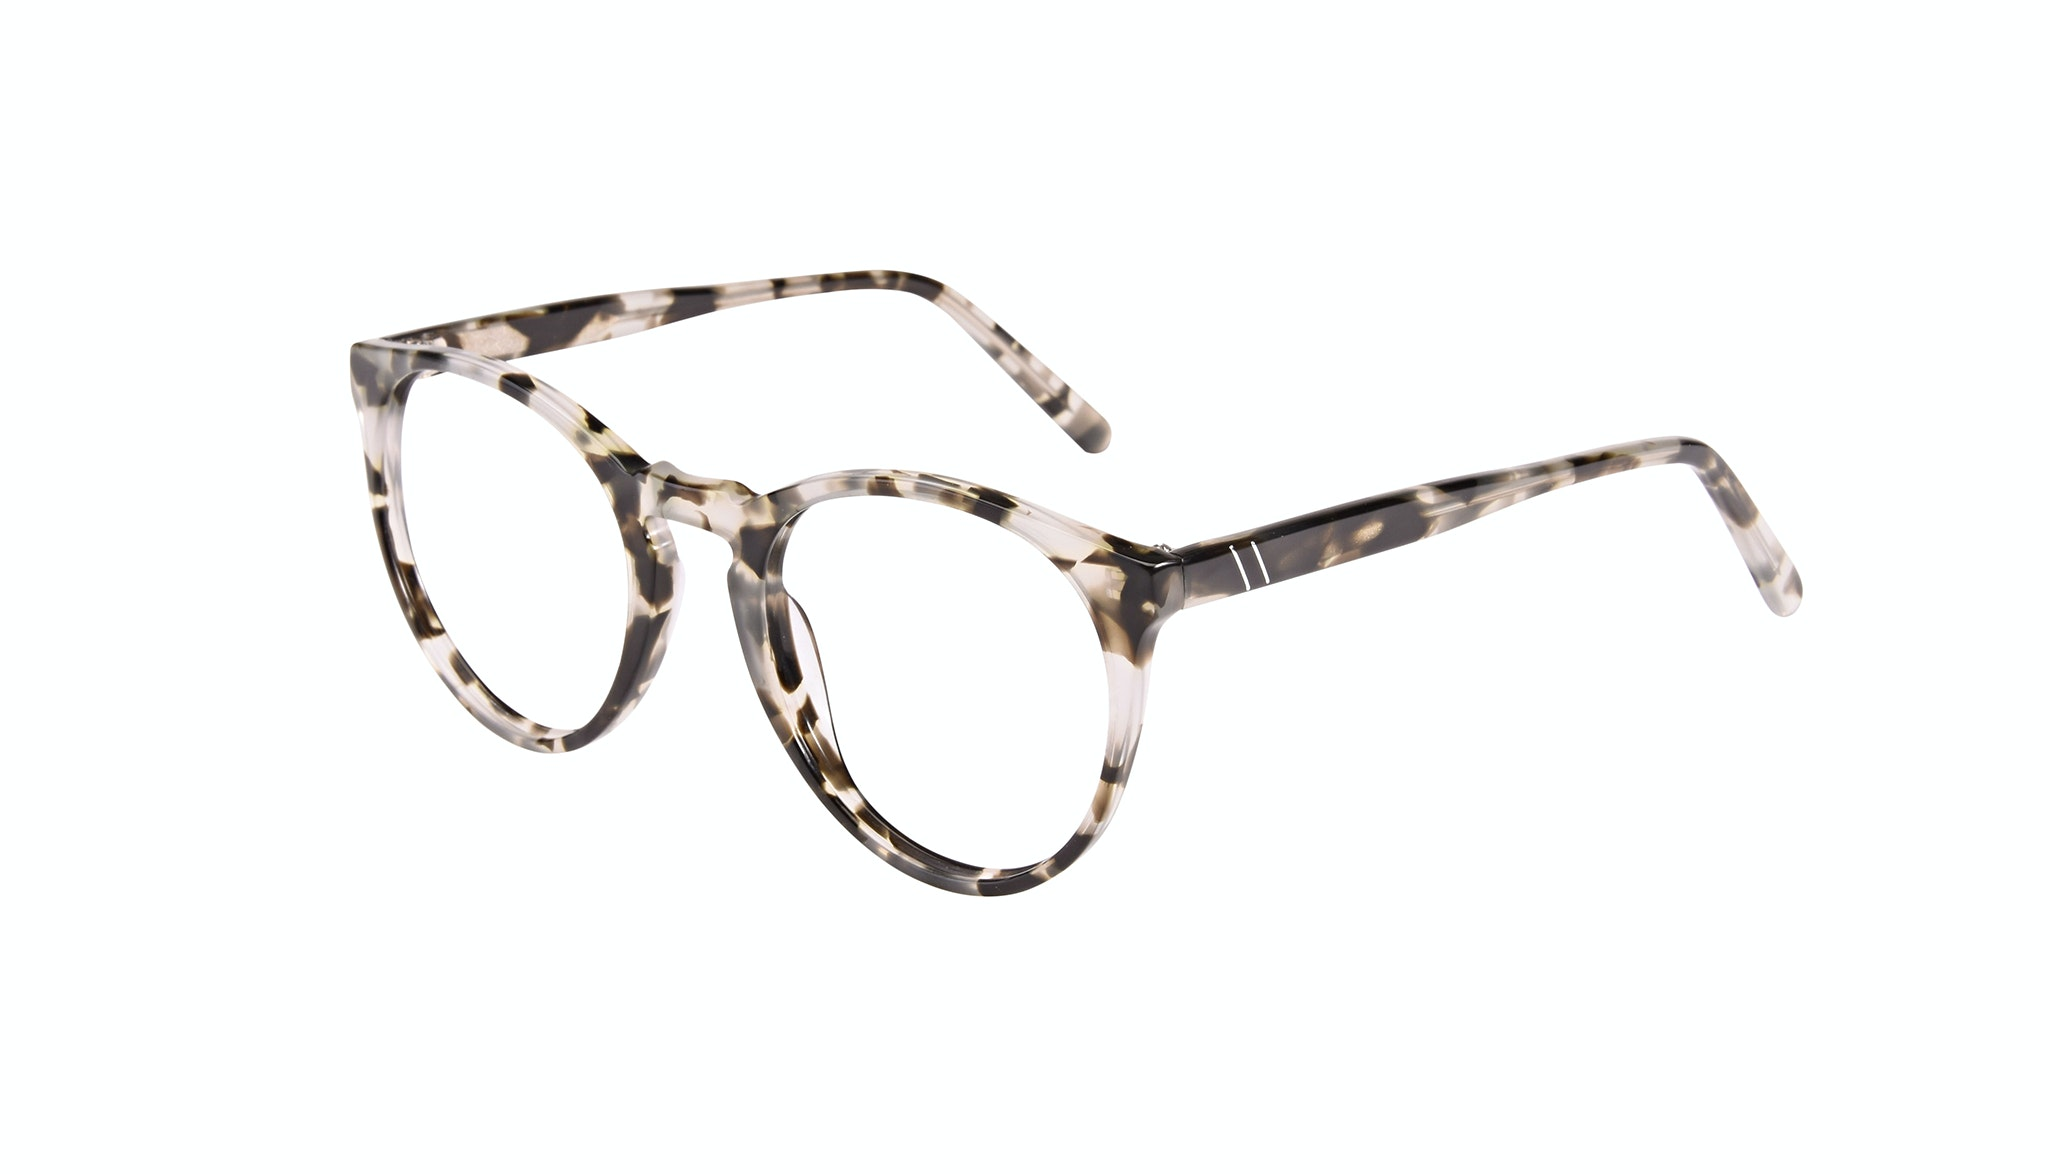 Affordable Fashion Glasses Round Eyeglasses Men Arch Camo Tort Tilt